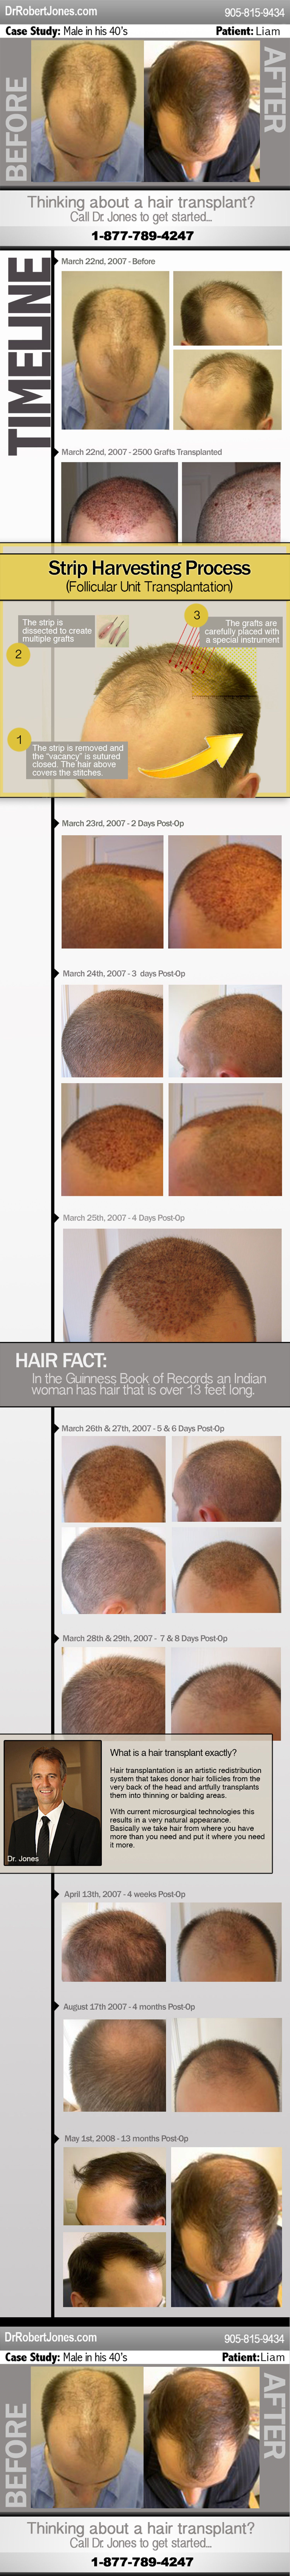 infographic-Liam-img-1